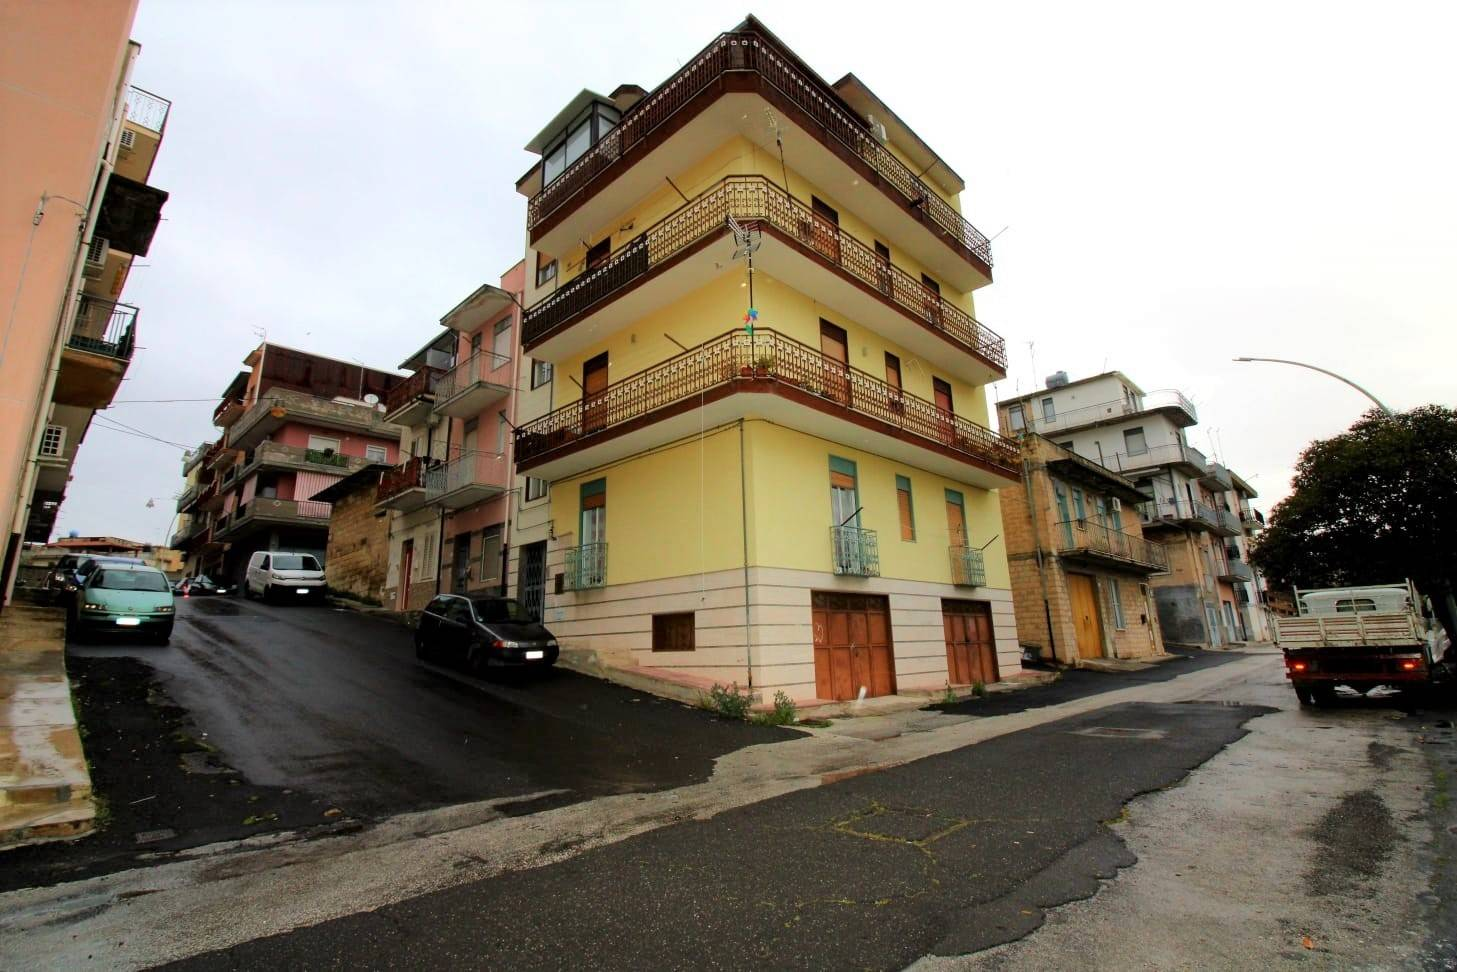 Casa singolaaCARLENTINI